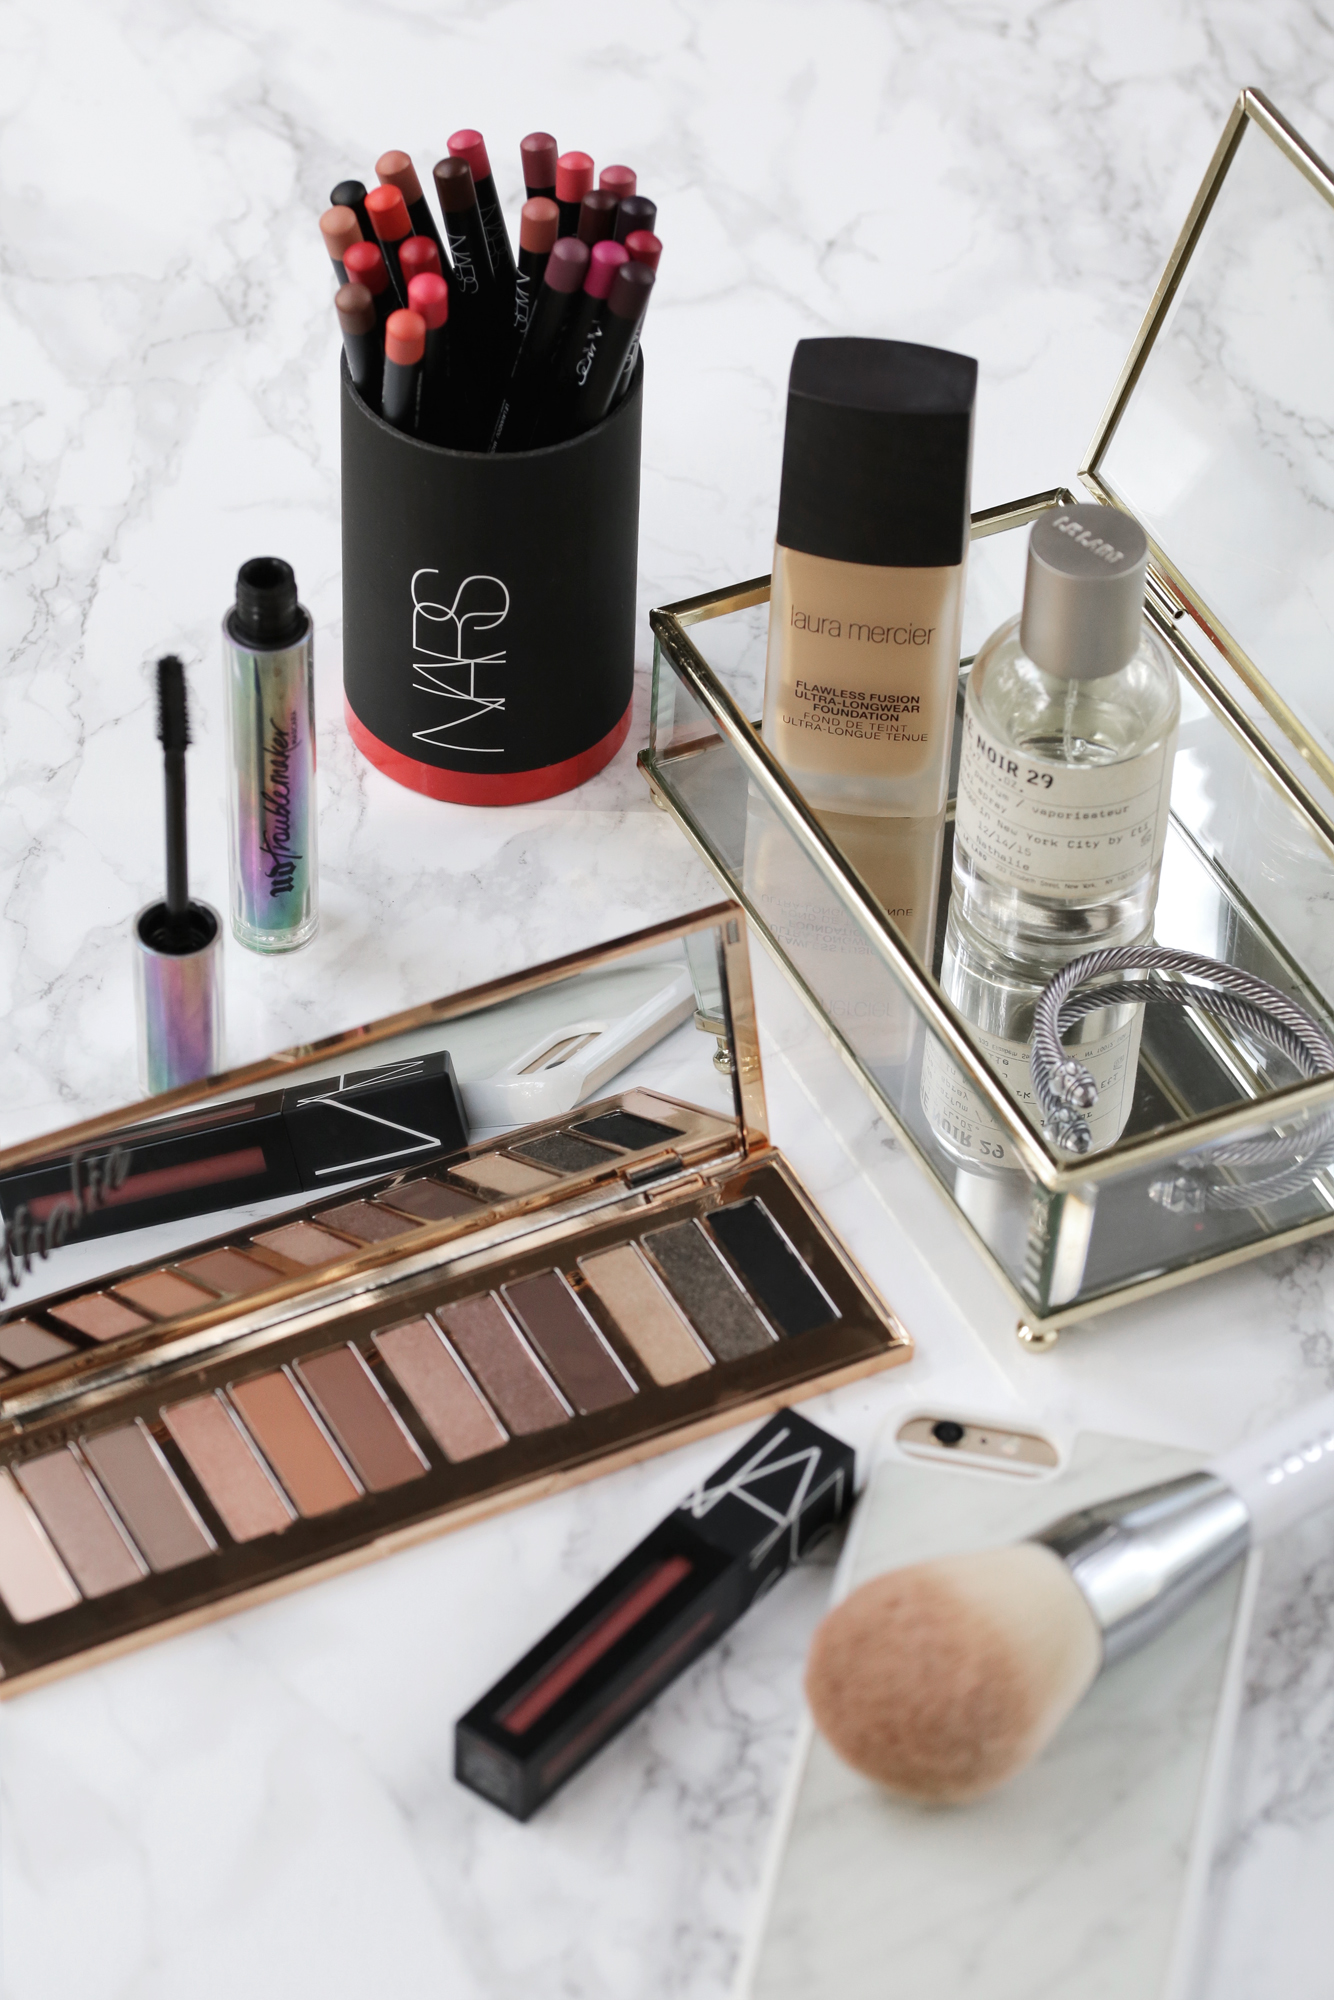 Charlotte Tilbury Hollywood eyeshadow palette and Nars Powermatte liquid lipstick_9108.jpg